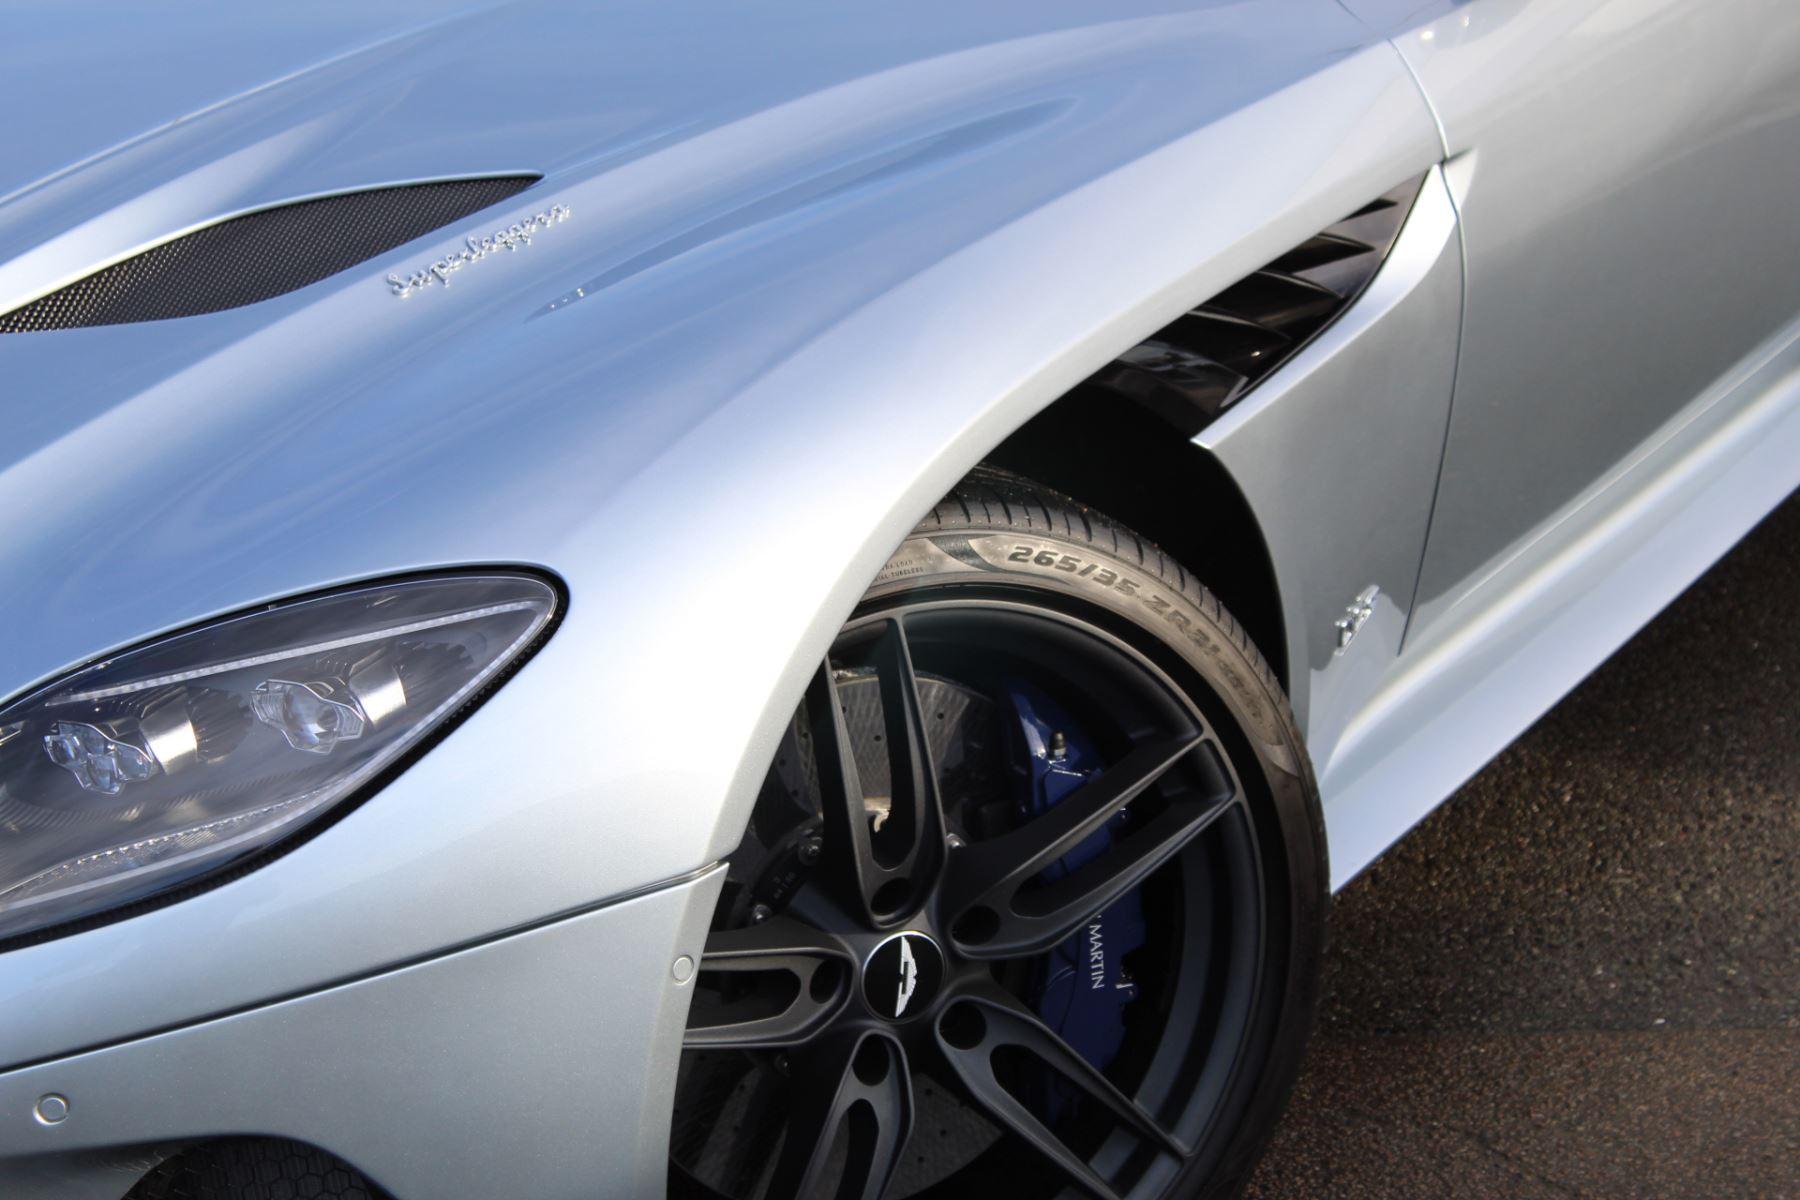 Aston Martin DBS Superleggera V12 2dr Touchtronic image 21